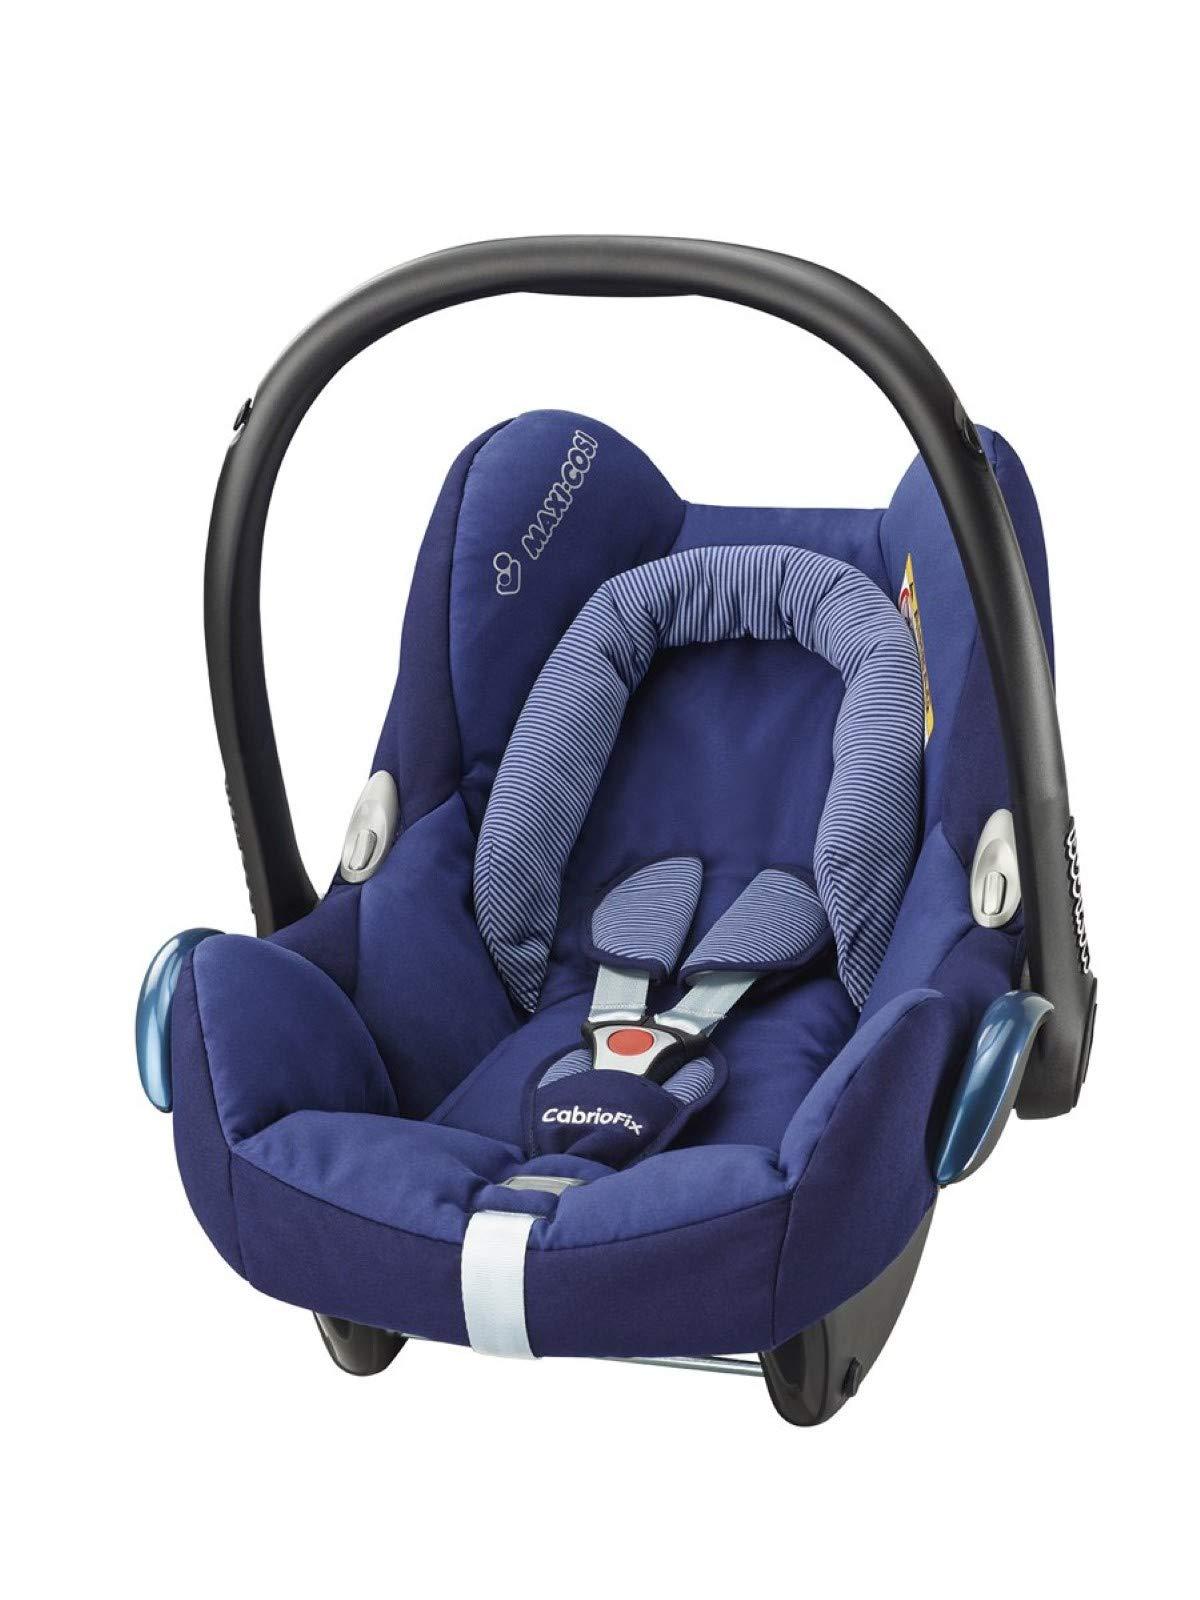 Maxi-Cosi Cabriofix Car Seat (river blue) Maxi-Cosi Top brand quality from Maxi-Cosi. 1